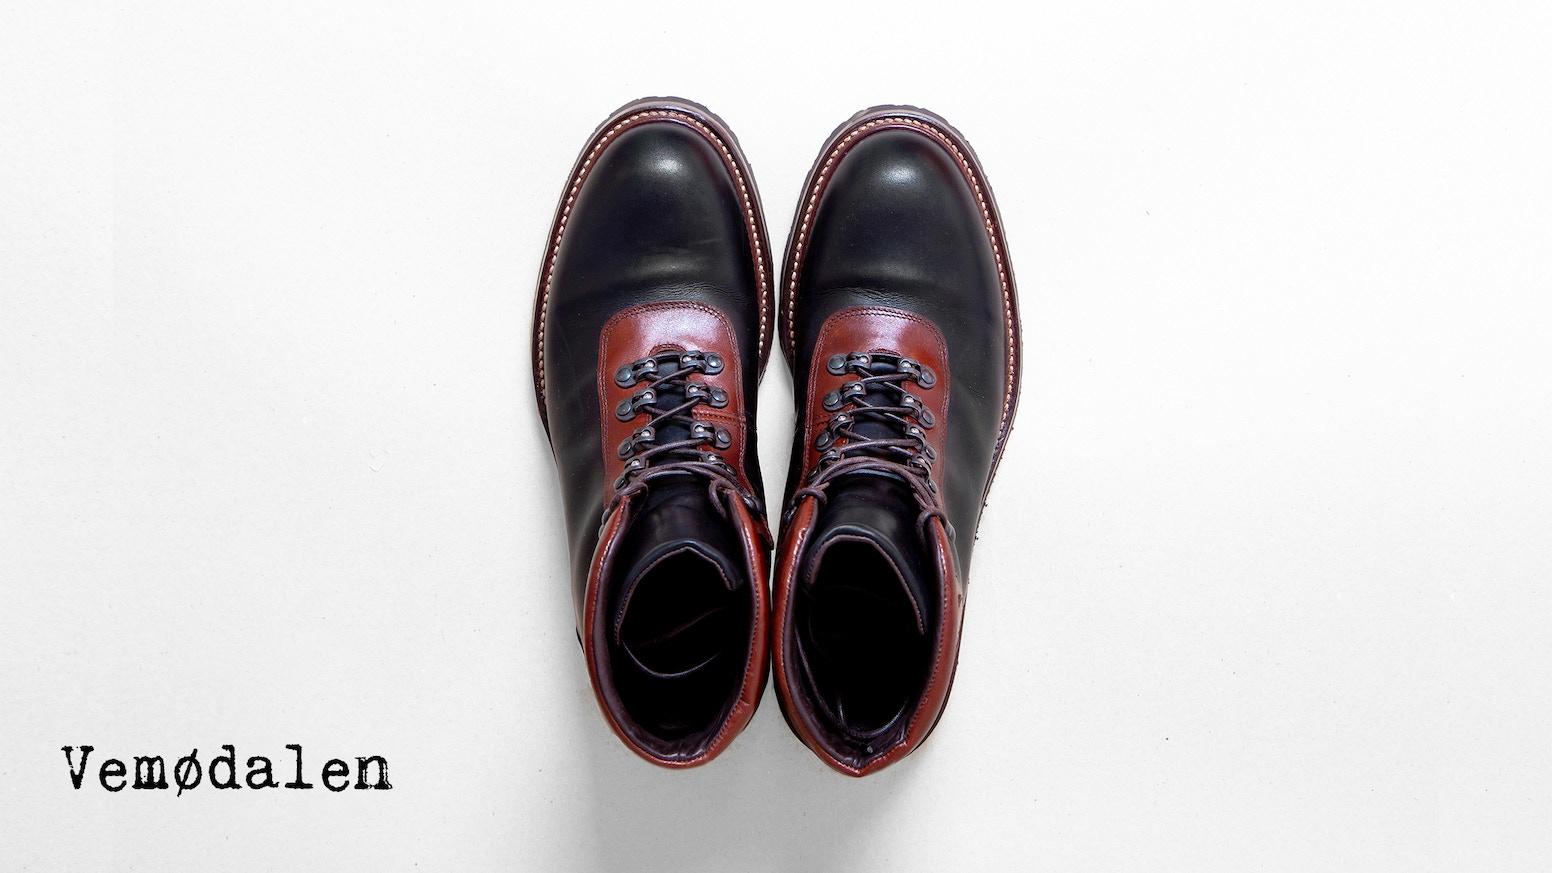 434e606b97eb Vemødalen Boots - The Saint Denis by Martin Eriksson — Kickstarter